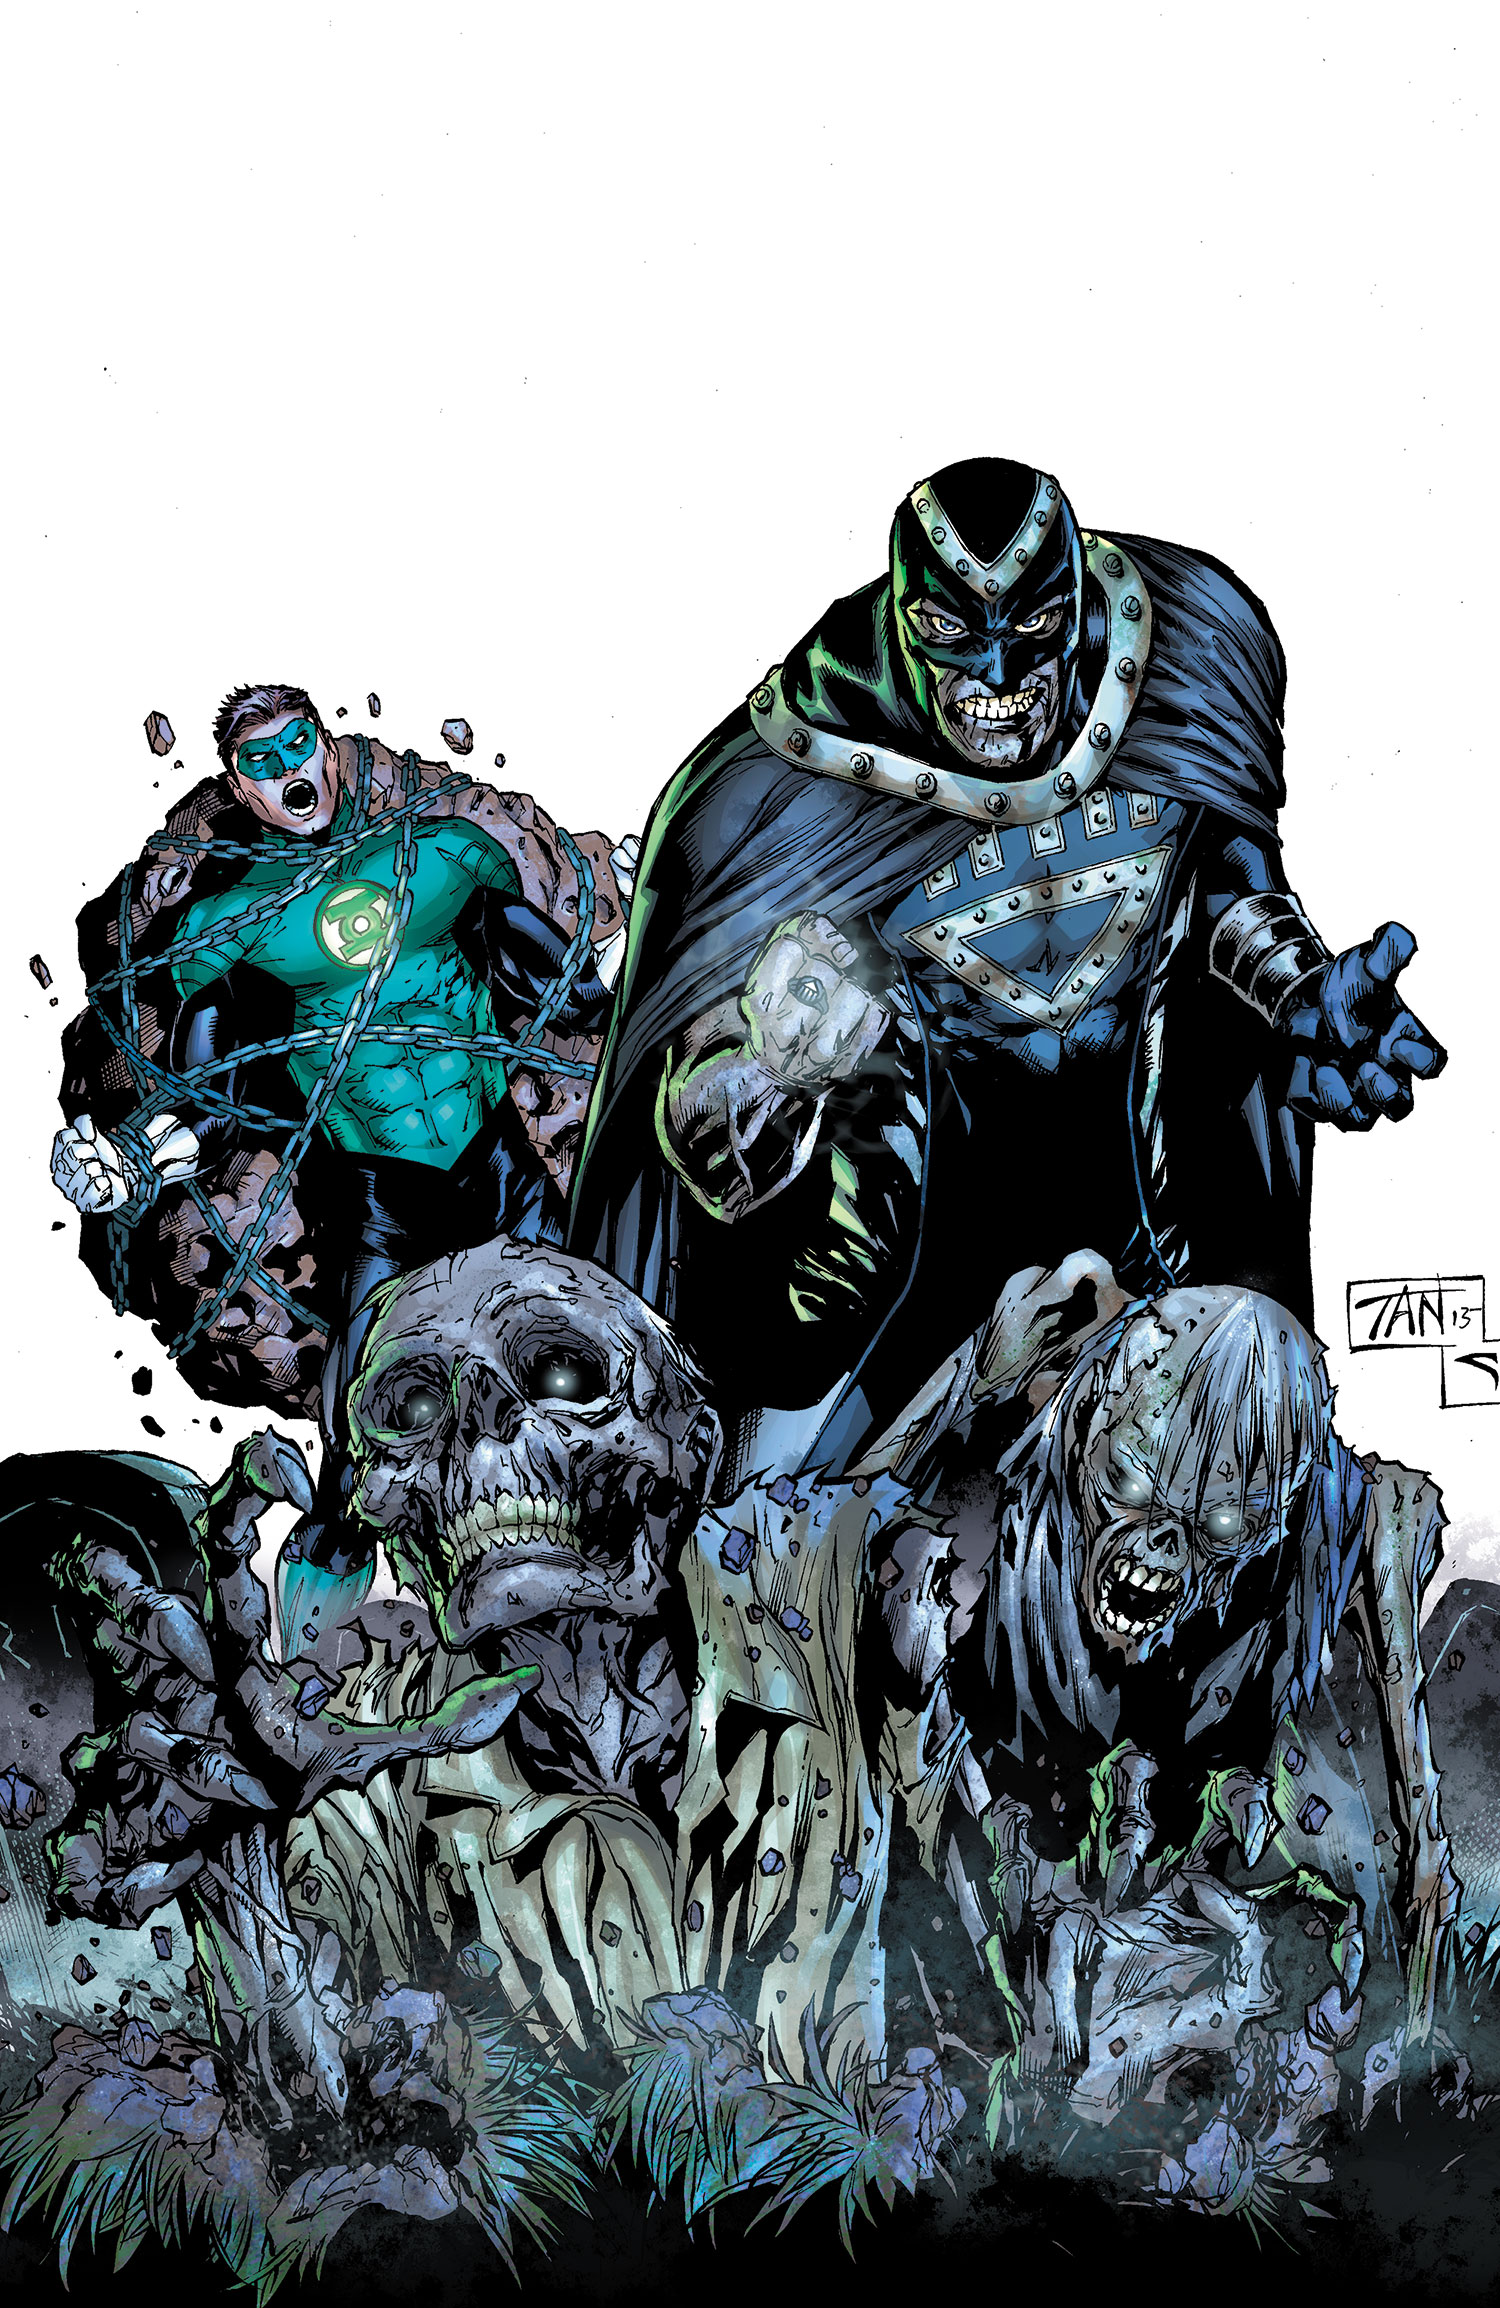 Green Lantern Vol 5 23.3 Black Hand Textless.jpg